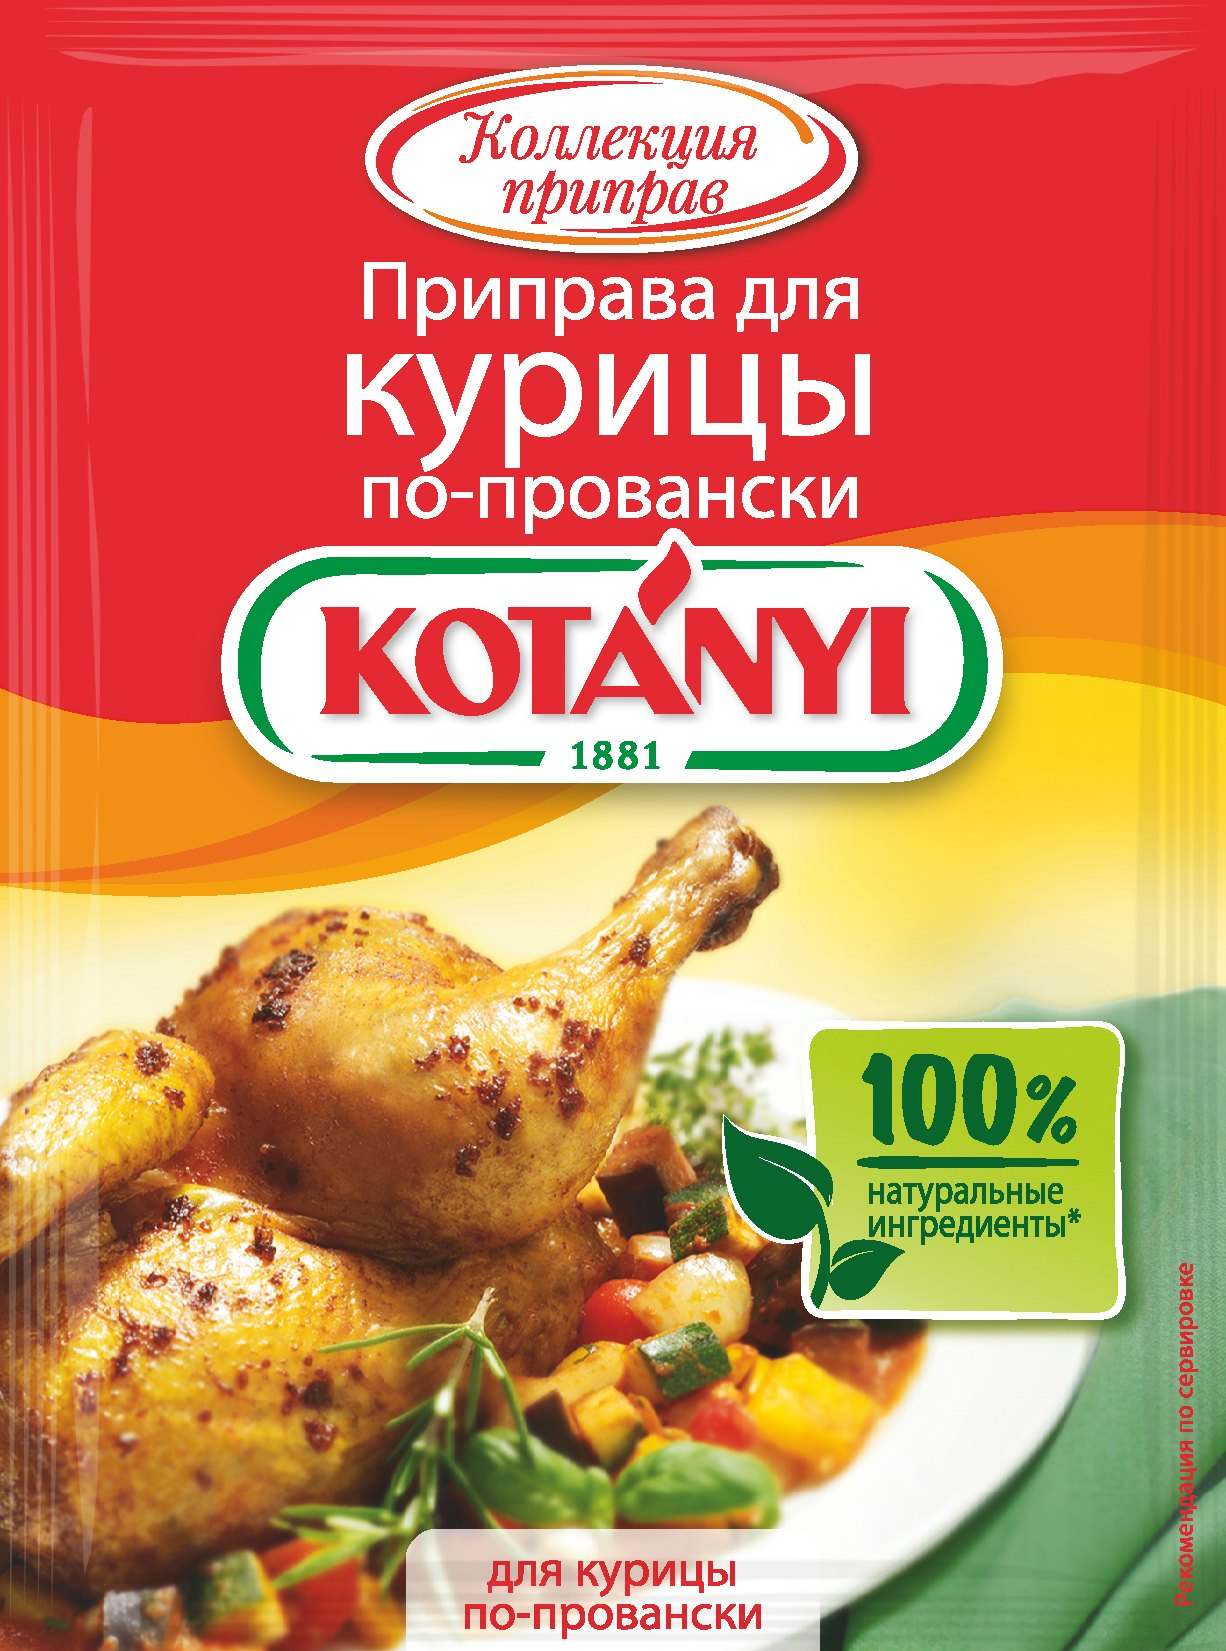 KOTANYI Приправа по-провански для курицы Kotanyi недорого